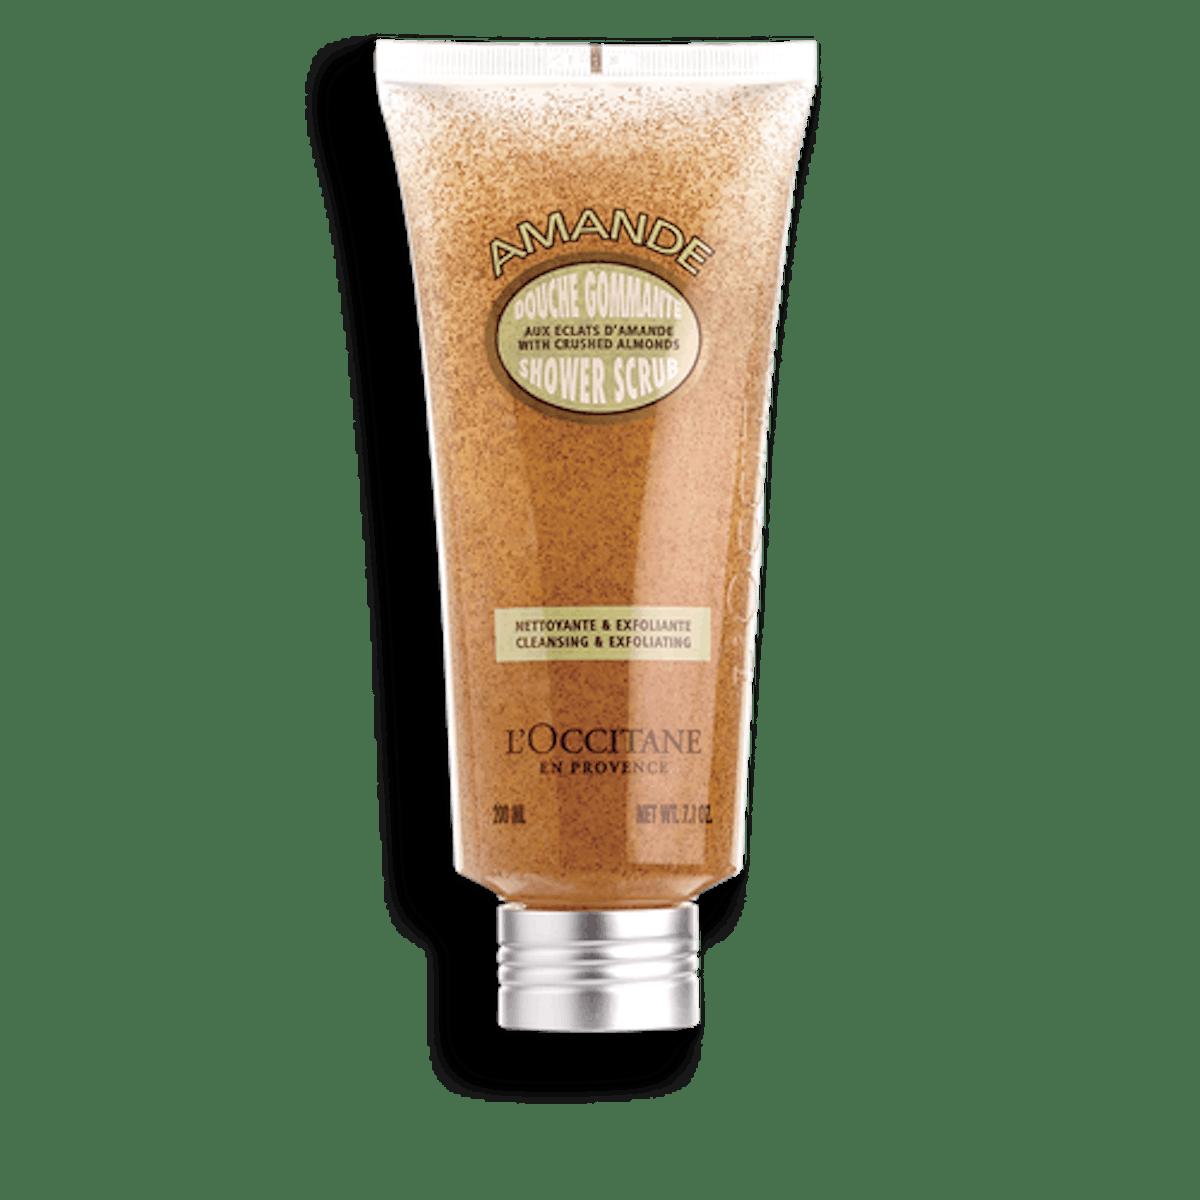 Almond Shower Exfoliating Scrub